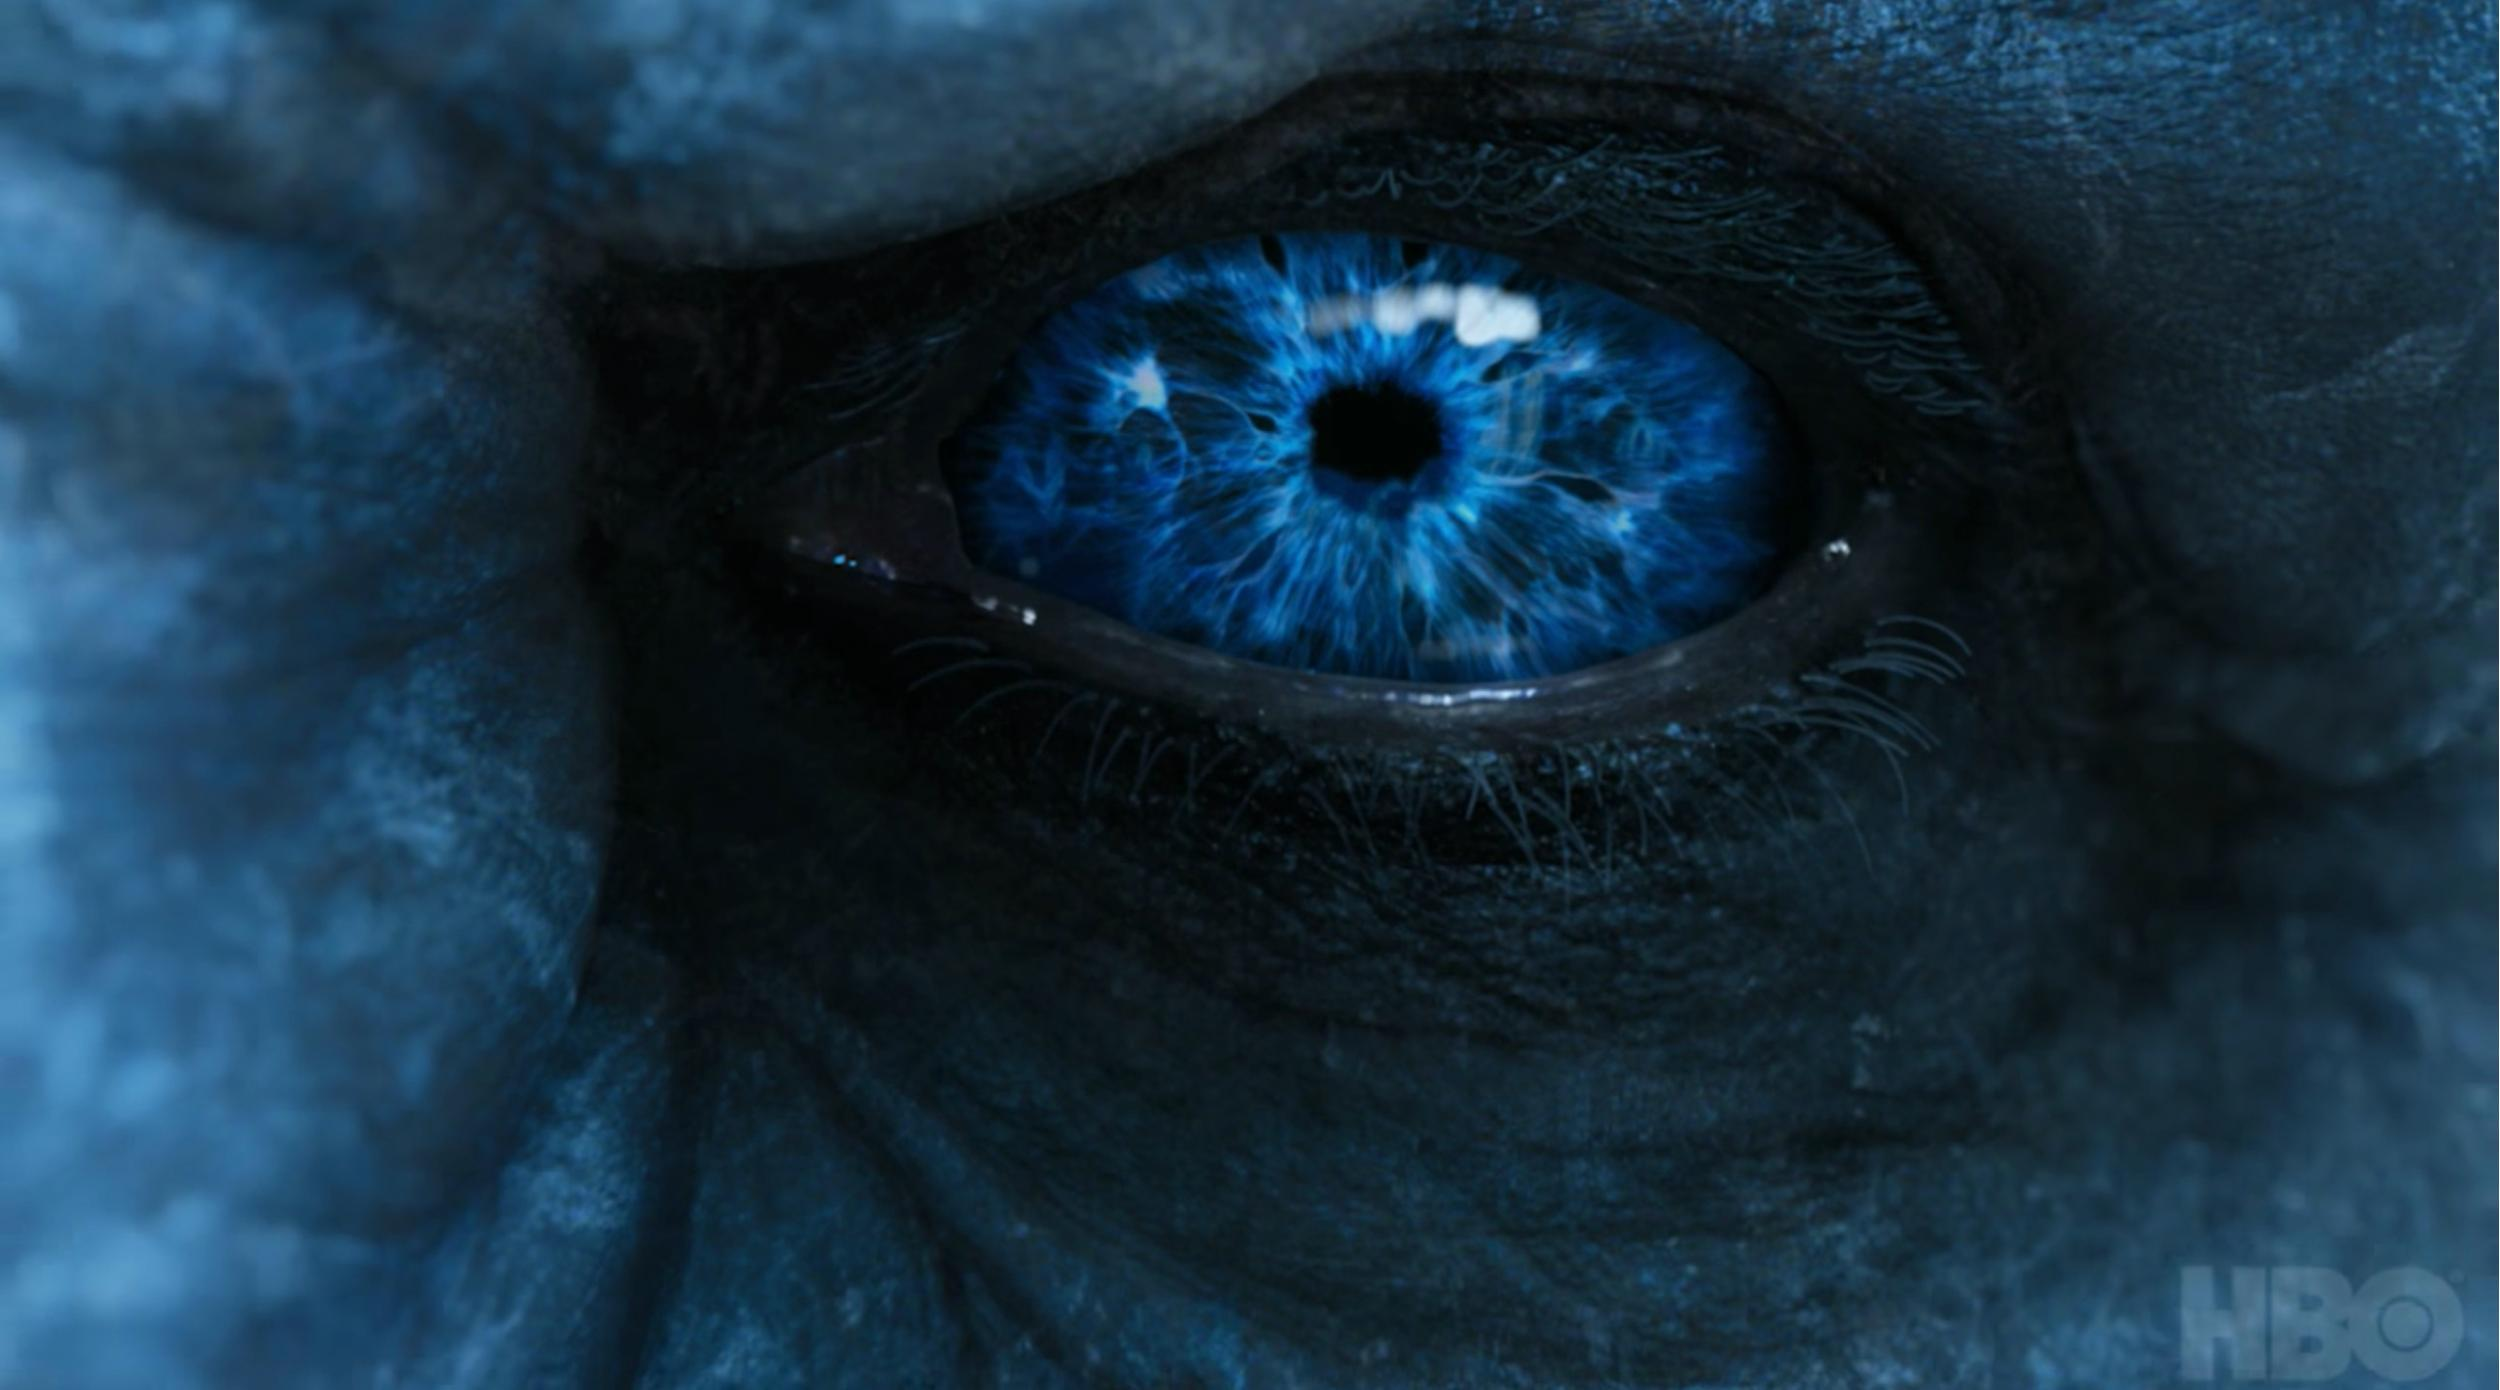 HBO revela 8 fotos del primer episodio de al séptima temporada de GOT